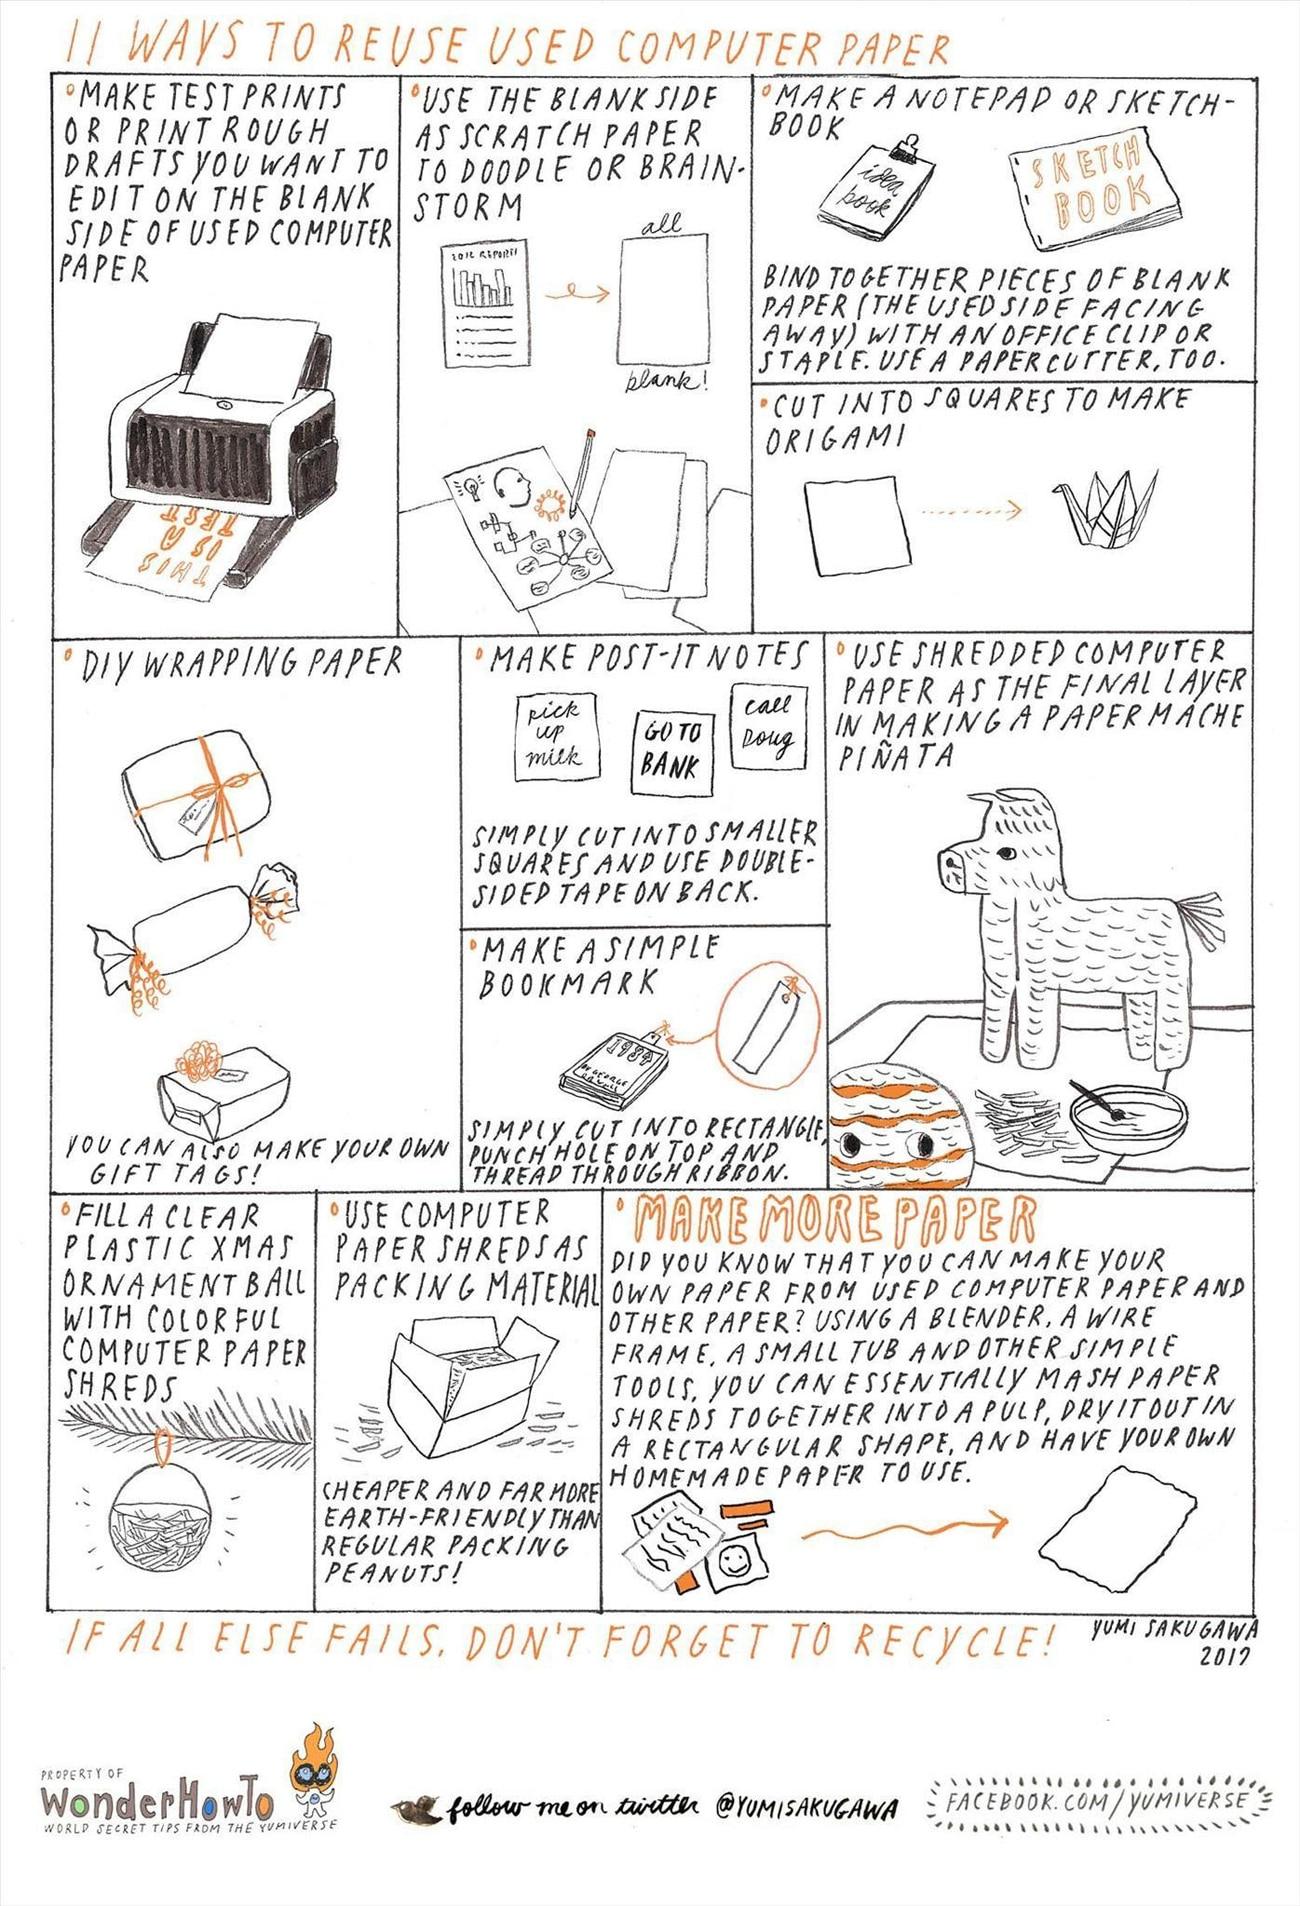 ways-to-reuse-computer-paper